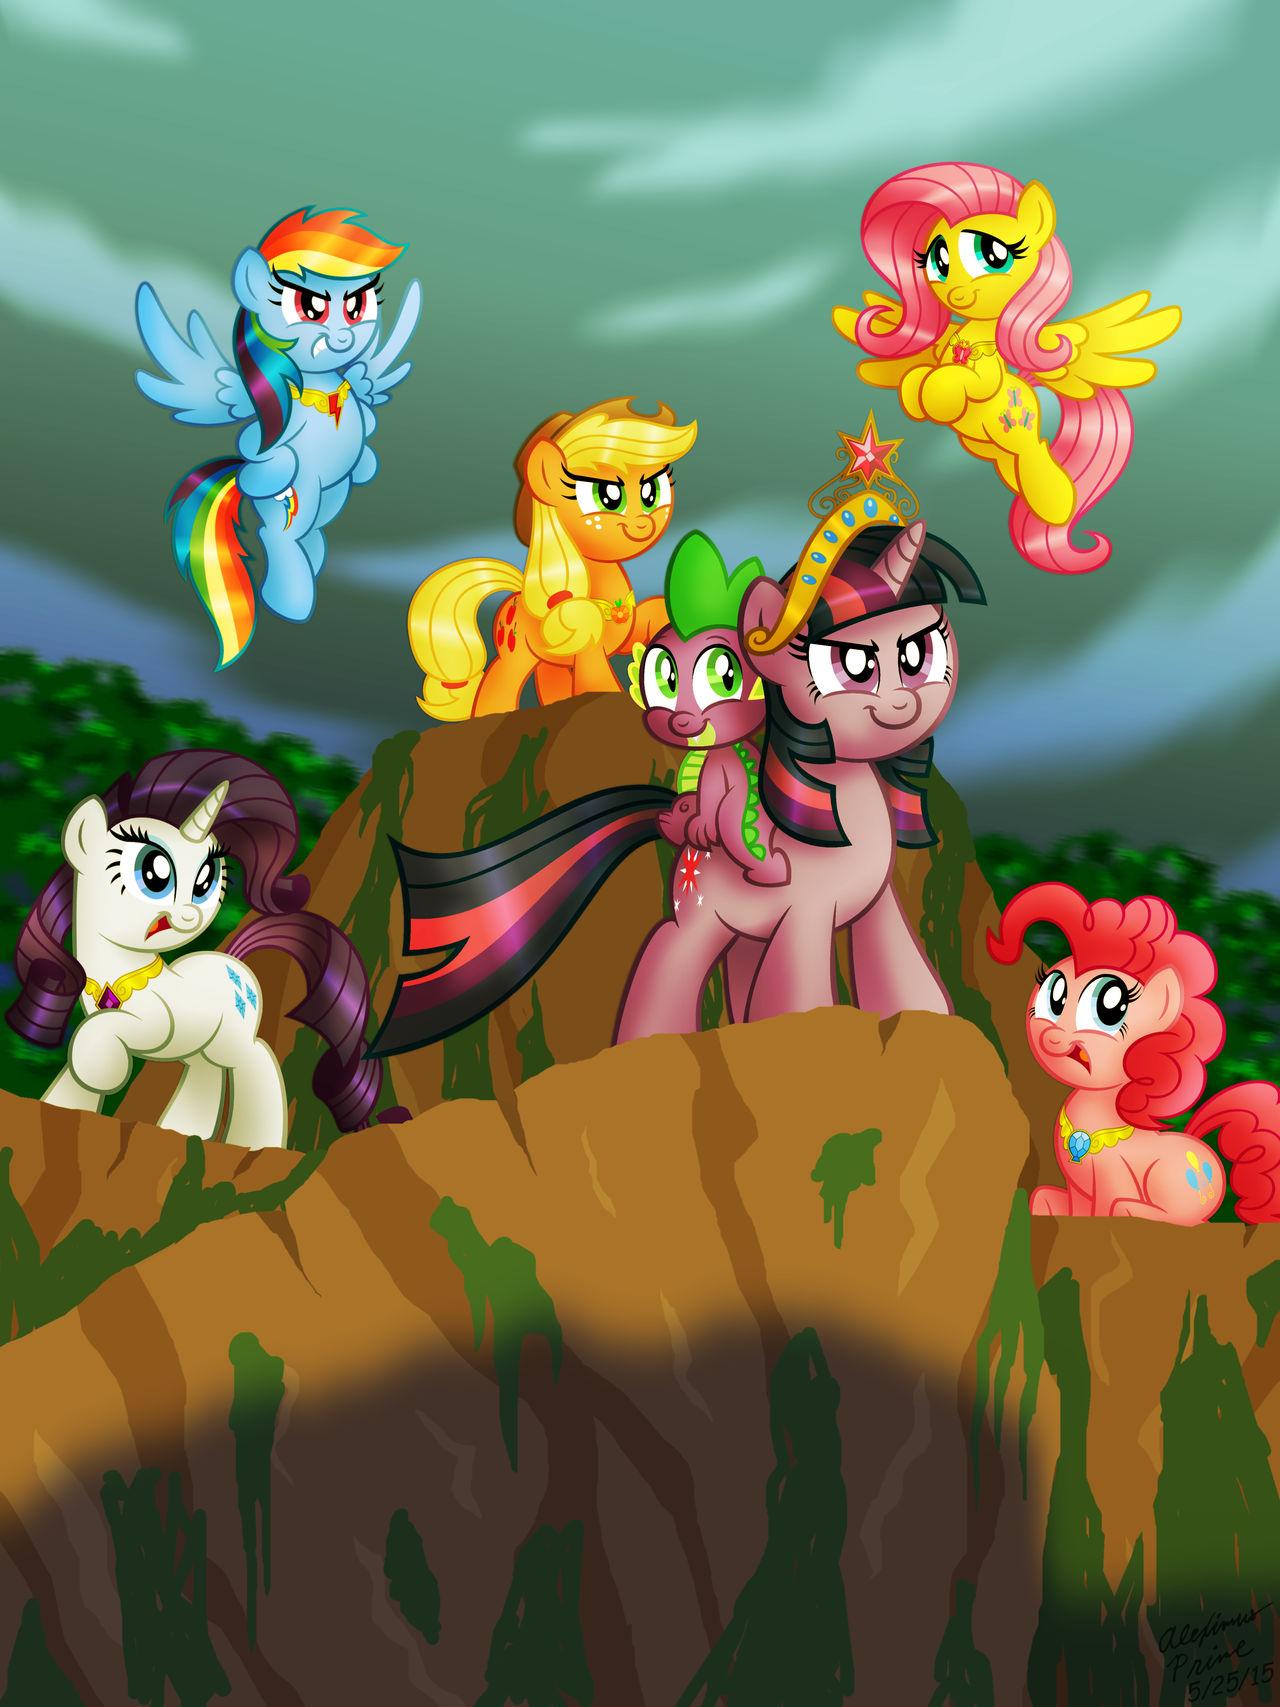 Heroes of Harmony